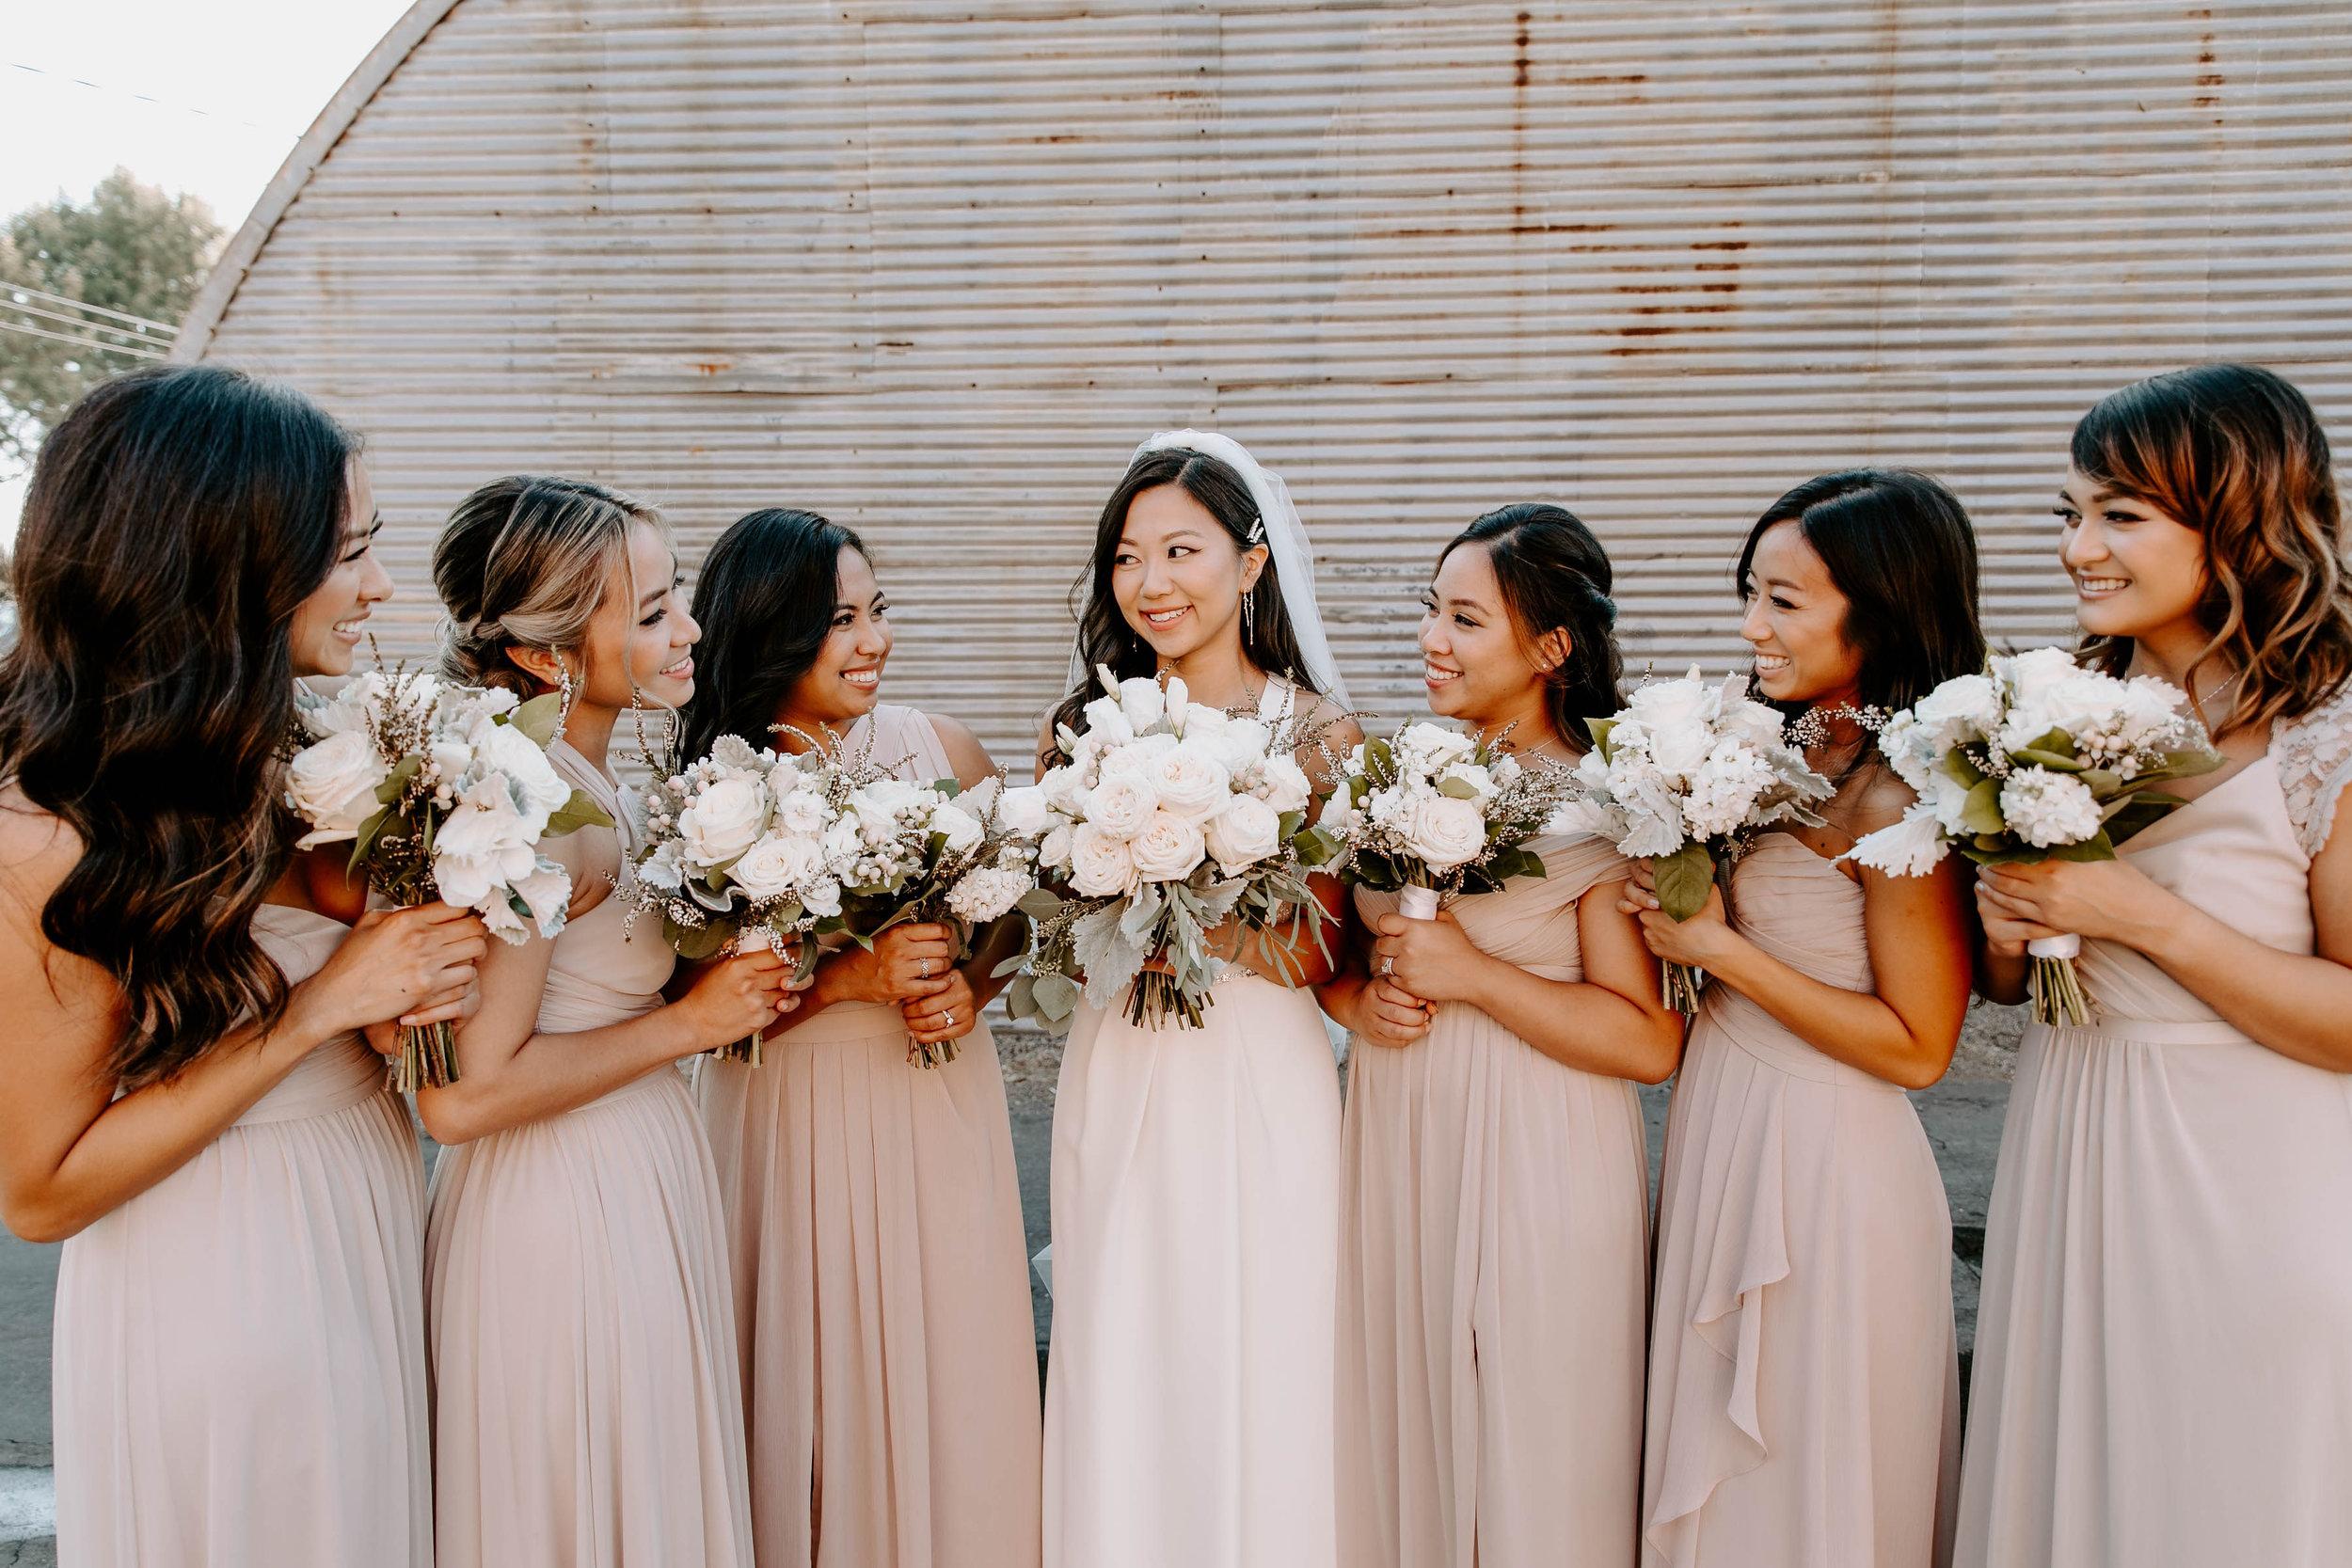 jessica-and-michael-wedding-teasers-76.jpg